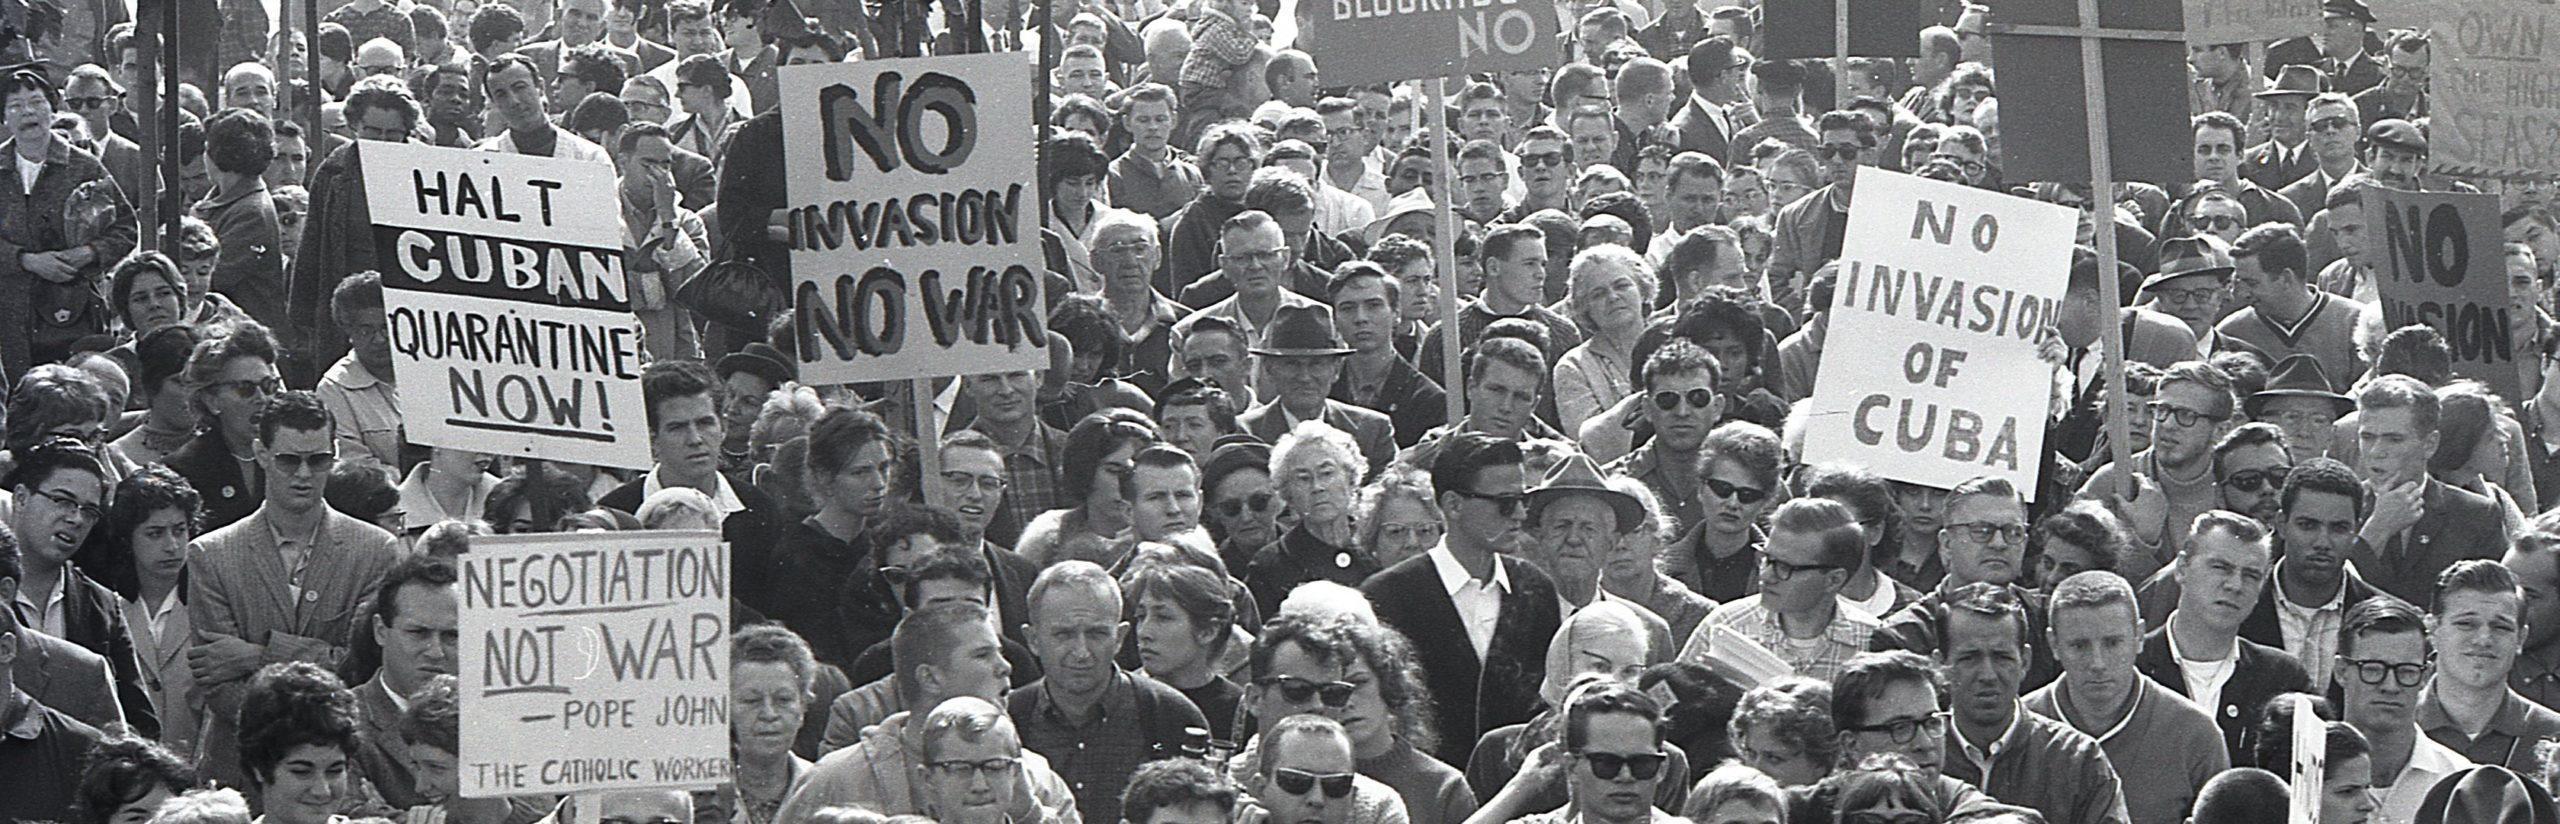 19621027Civic Center Cuba En 15001 header image